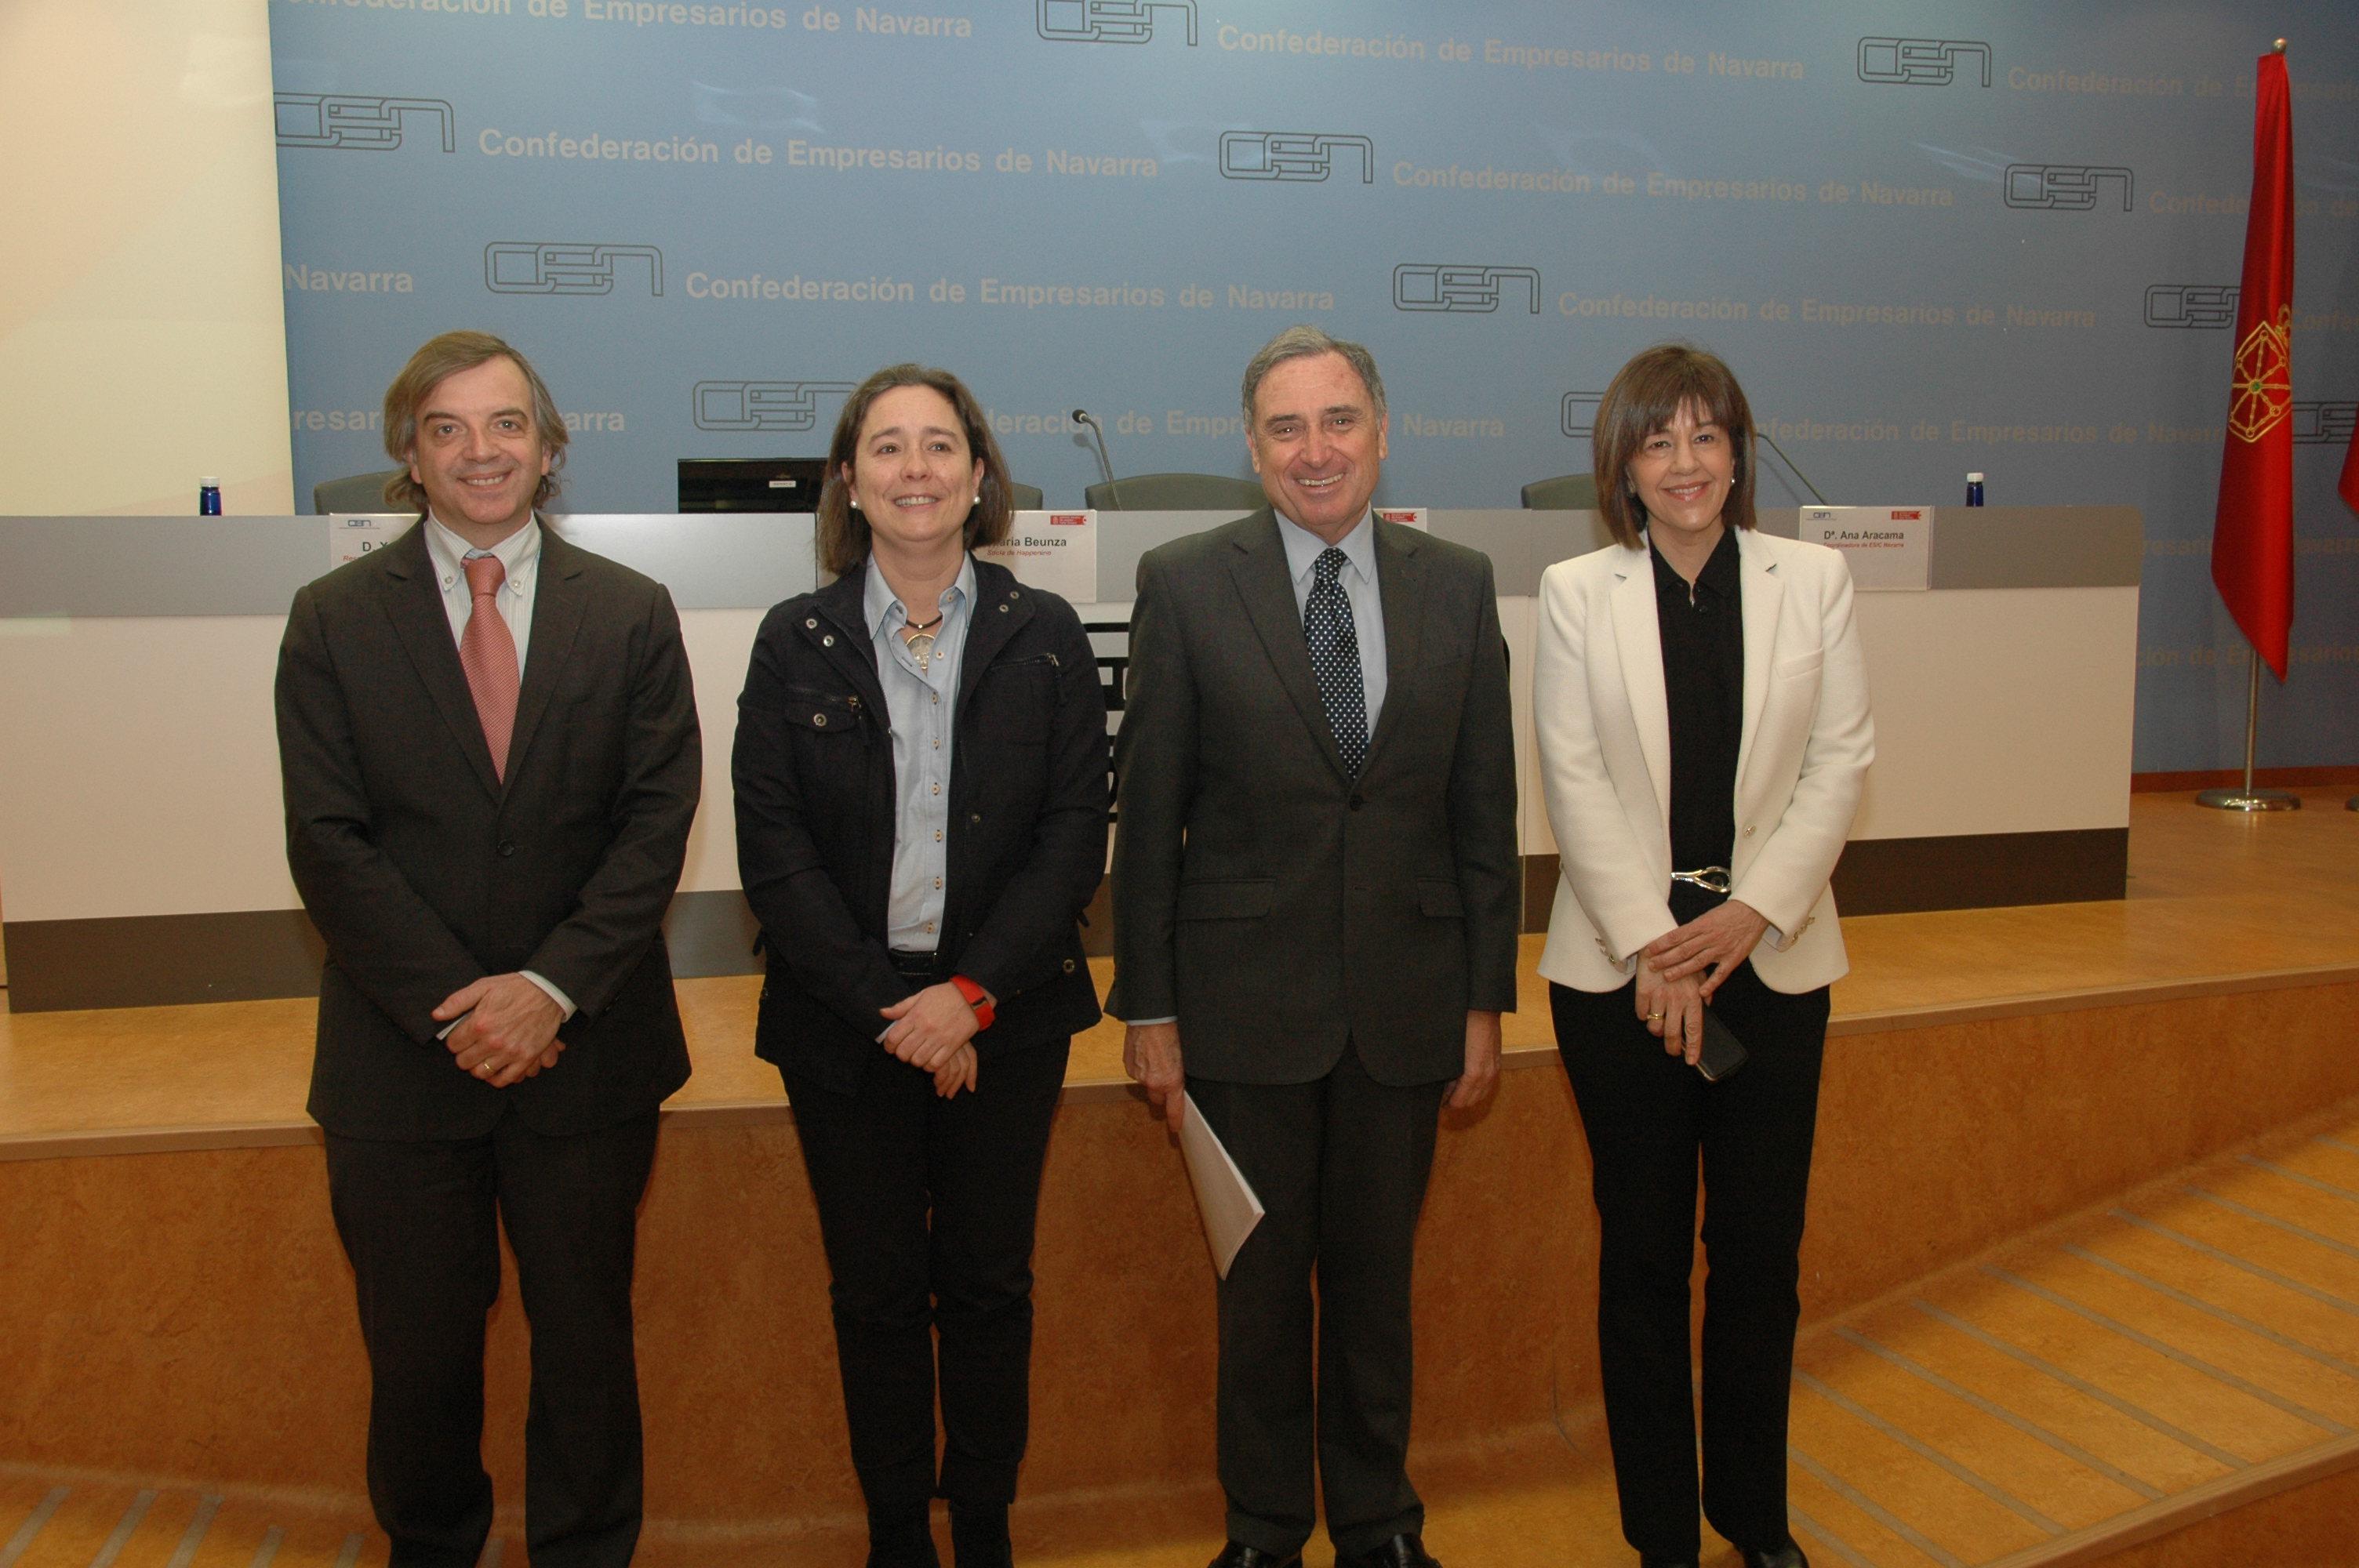 Estudio CEN sobre Innovación en Centros Educativos Navarros